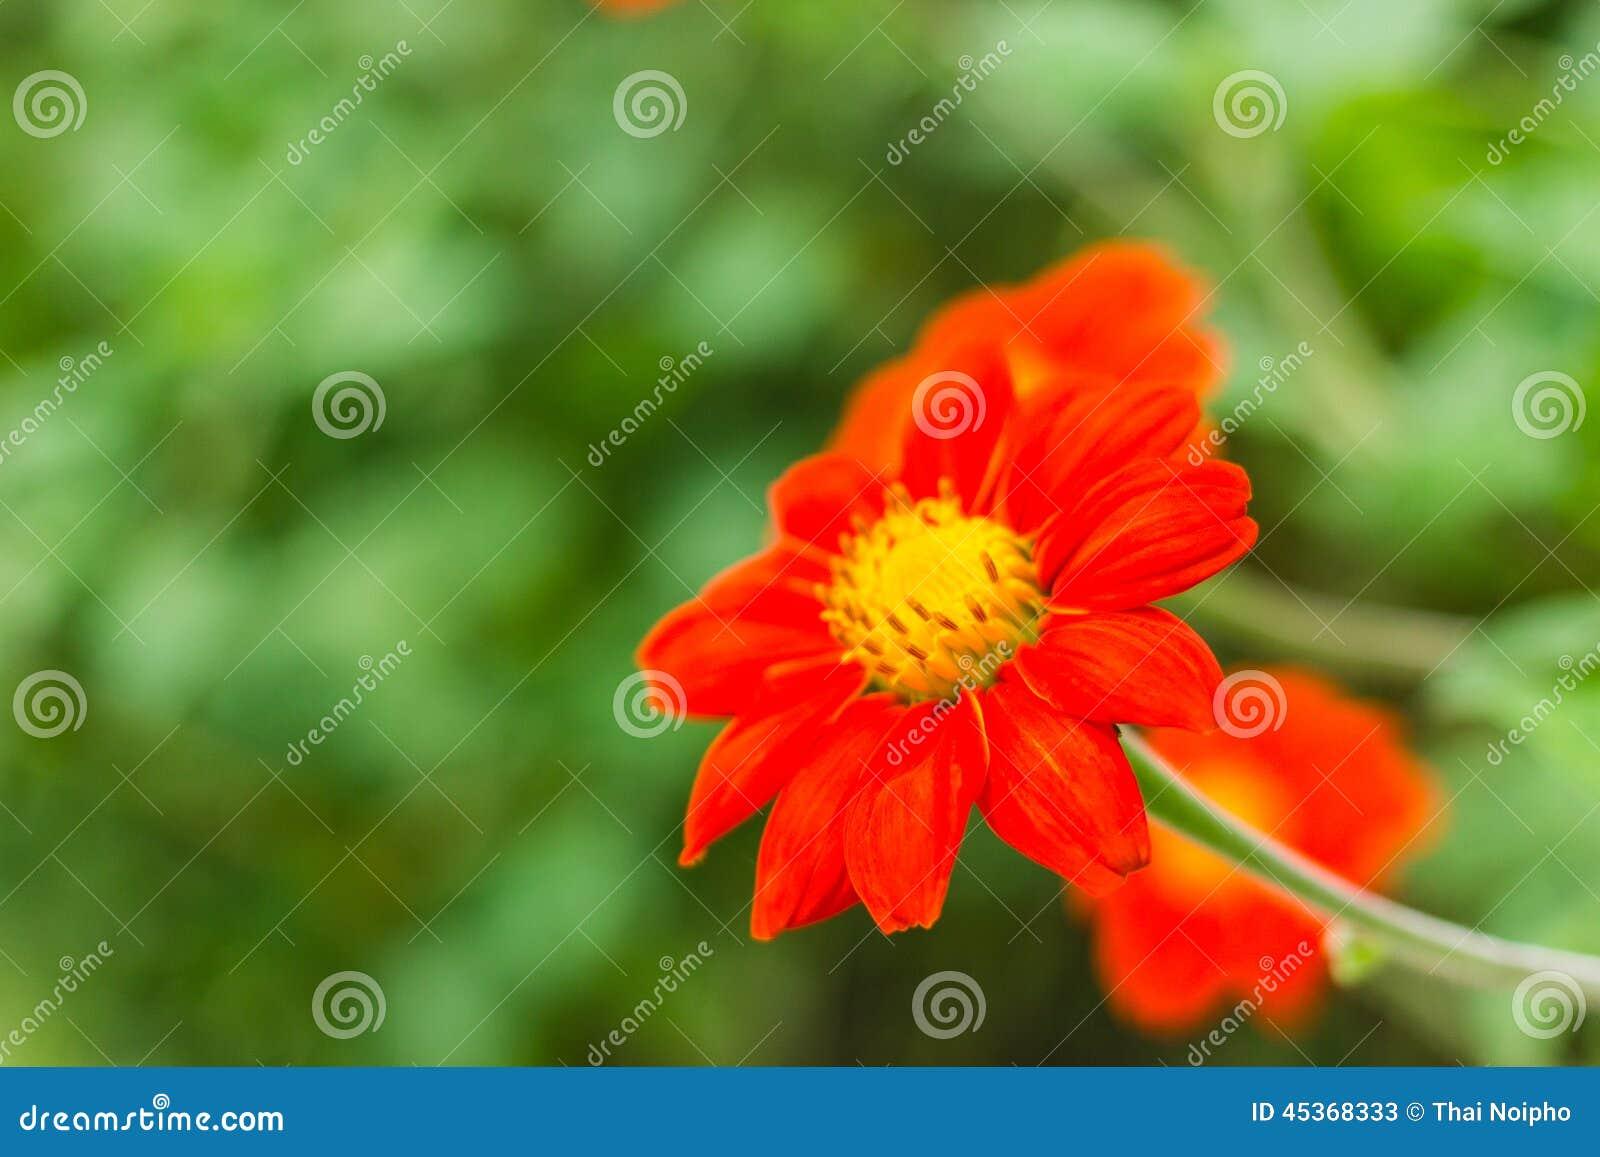 Fleur orange en nature